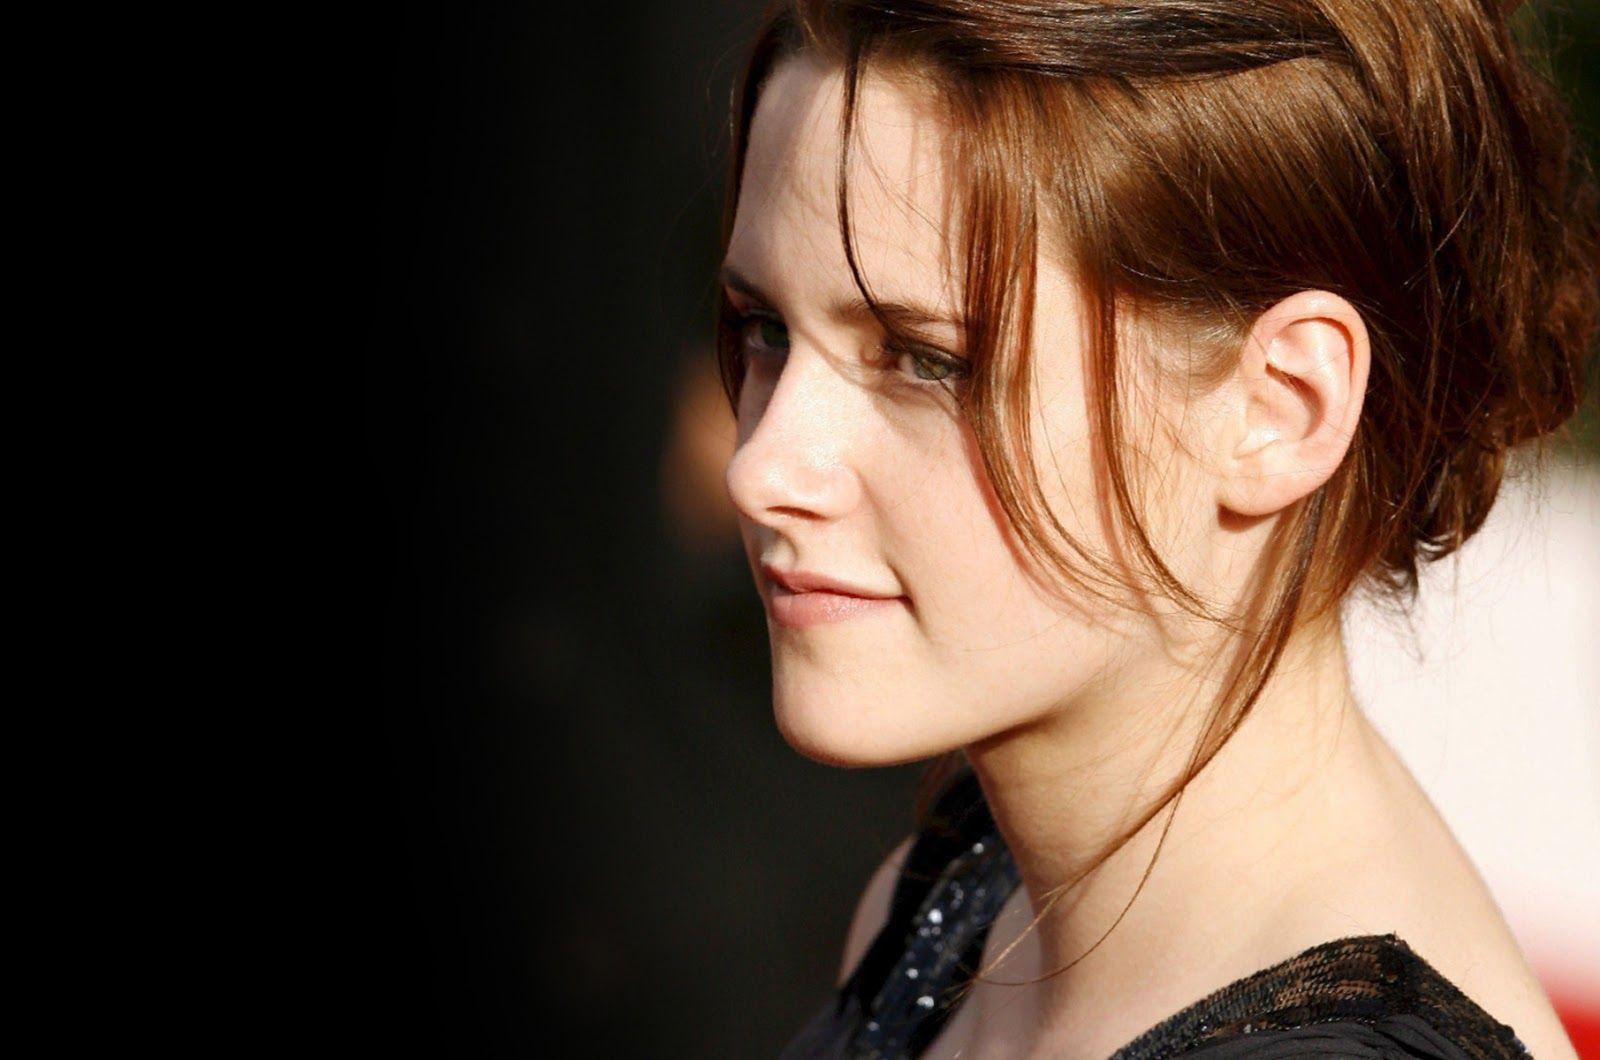 kristen stewart hollywood actress - photo #39